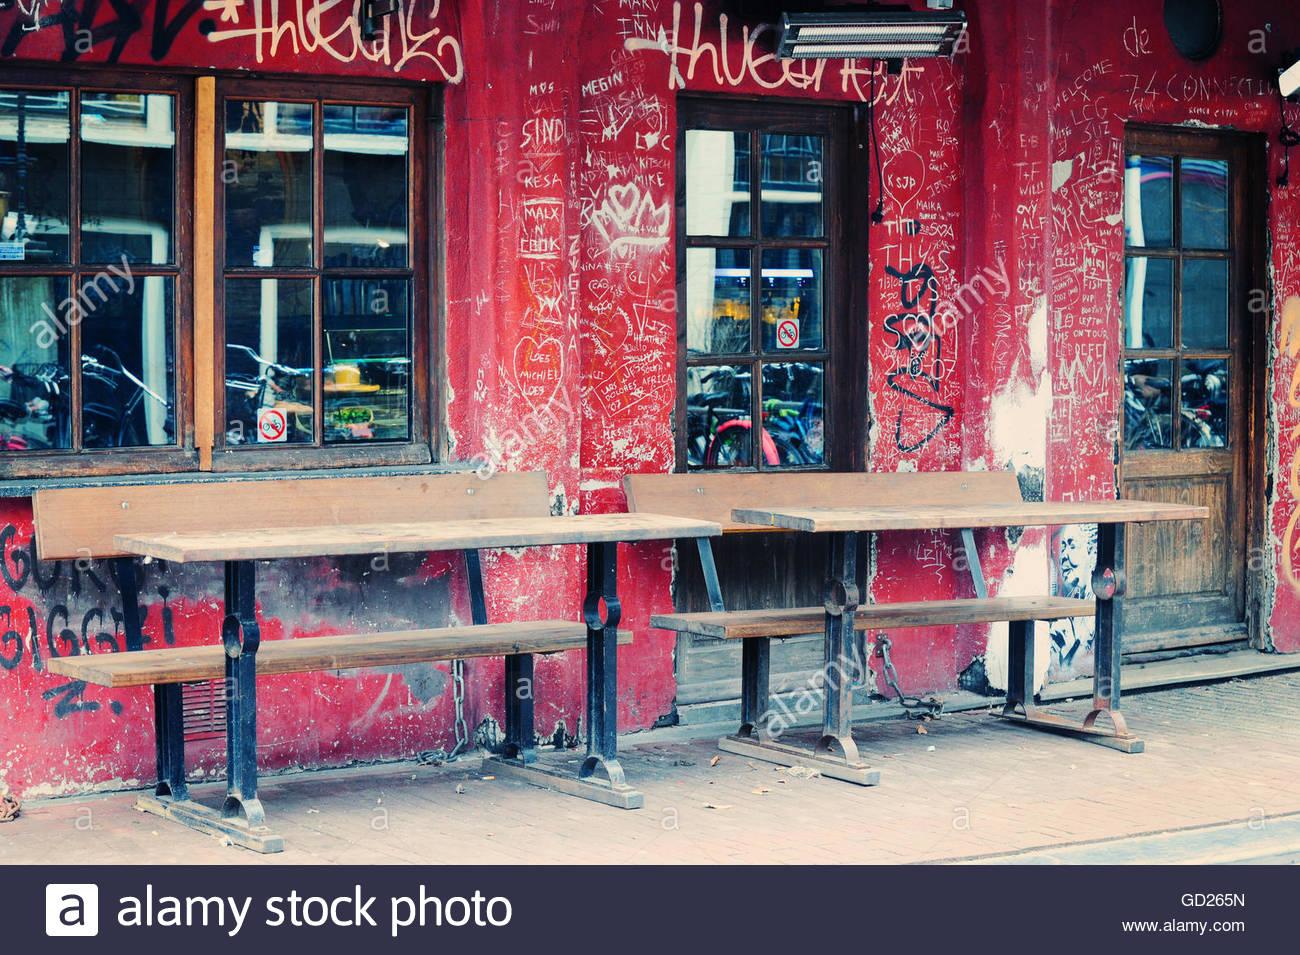 Wand in amsterdam holland stockfotos wand in amsterdam holland bilder alamy - Graffiti zimmerwand ...